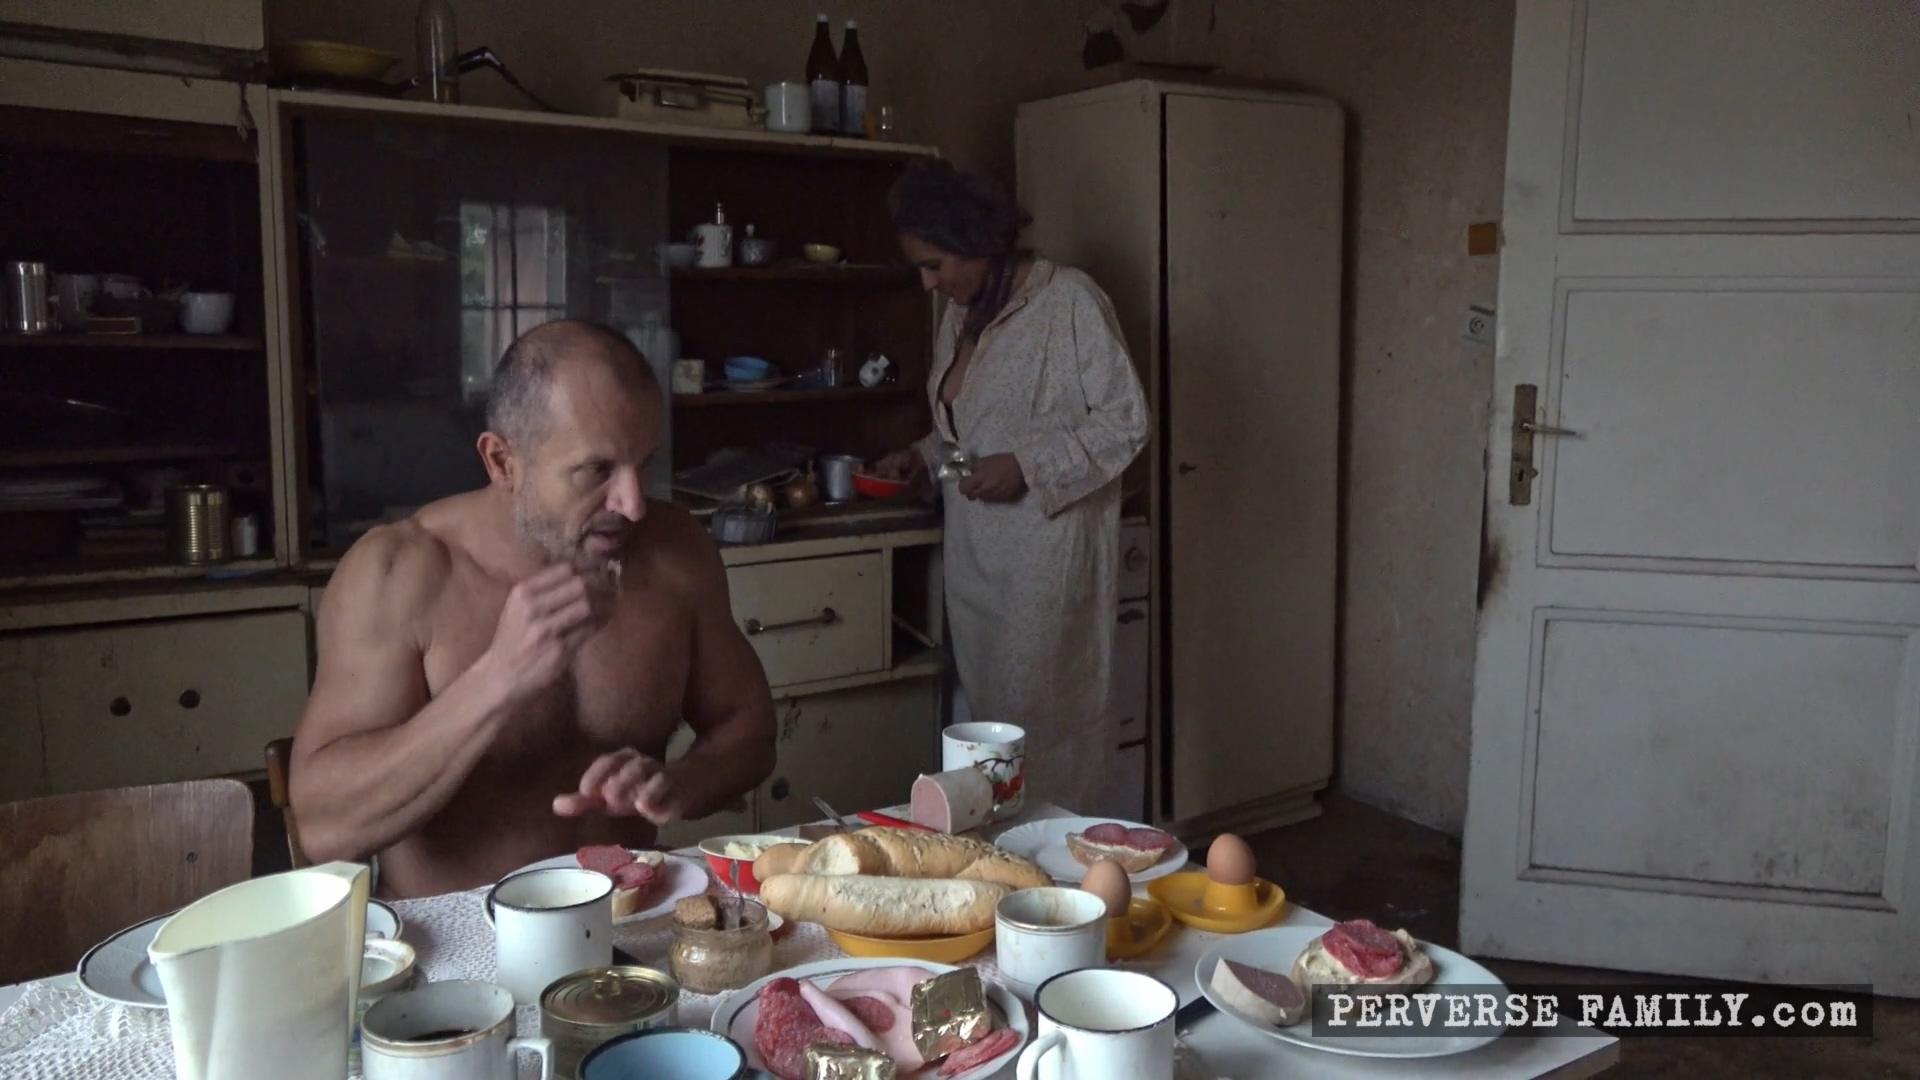 perverse-family-unexpected-breakfast-1920x1080_mp4_20191031_085706_855.jpg